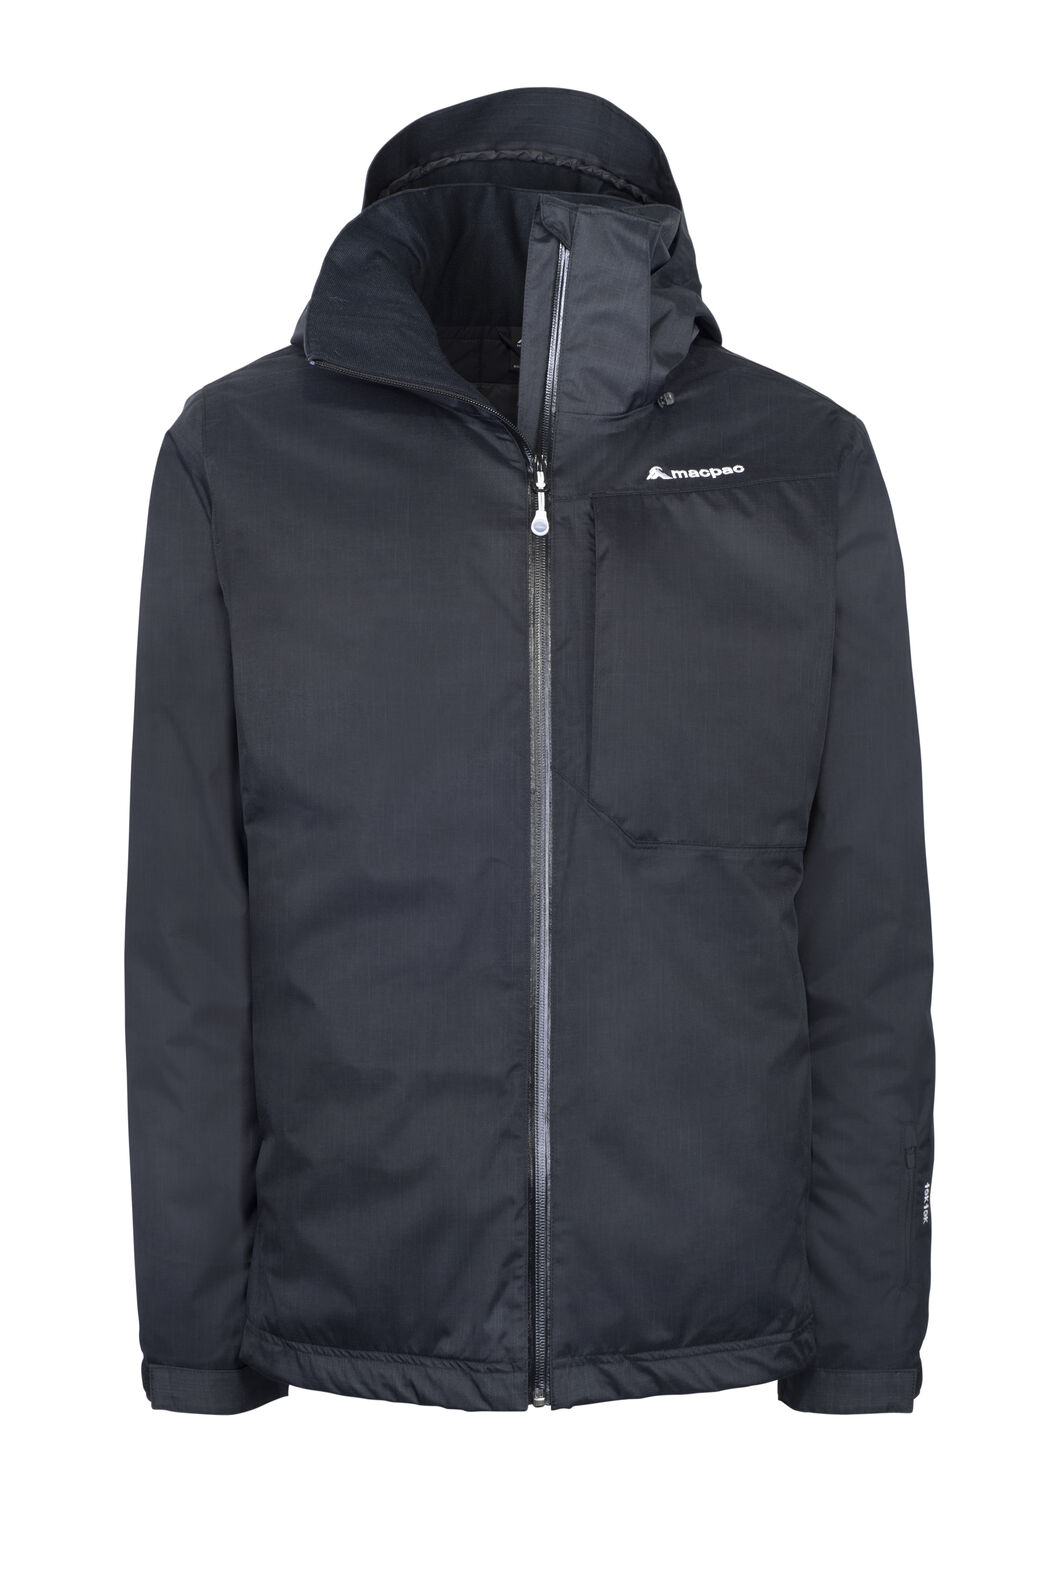 Macpac Powder Reflex™ Ski Jacket — Men's, Black, hi-res